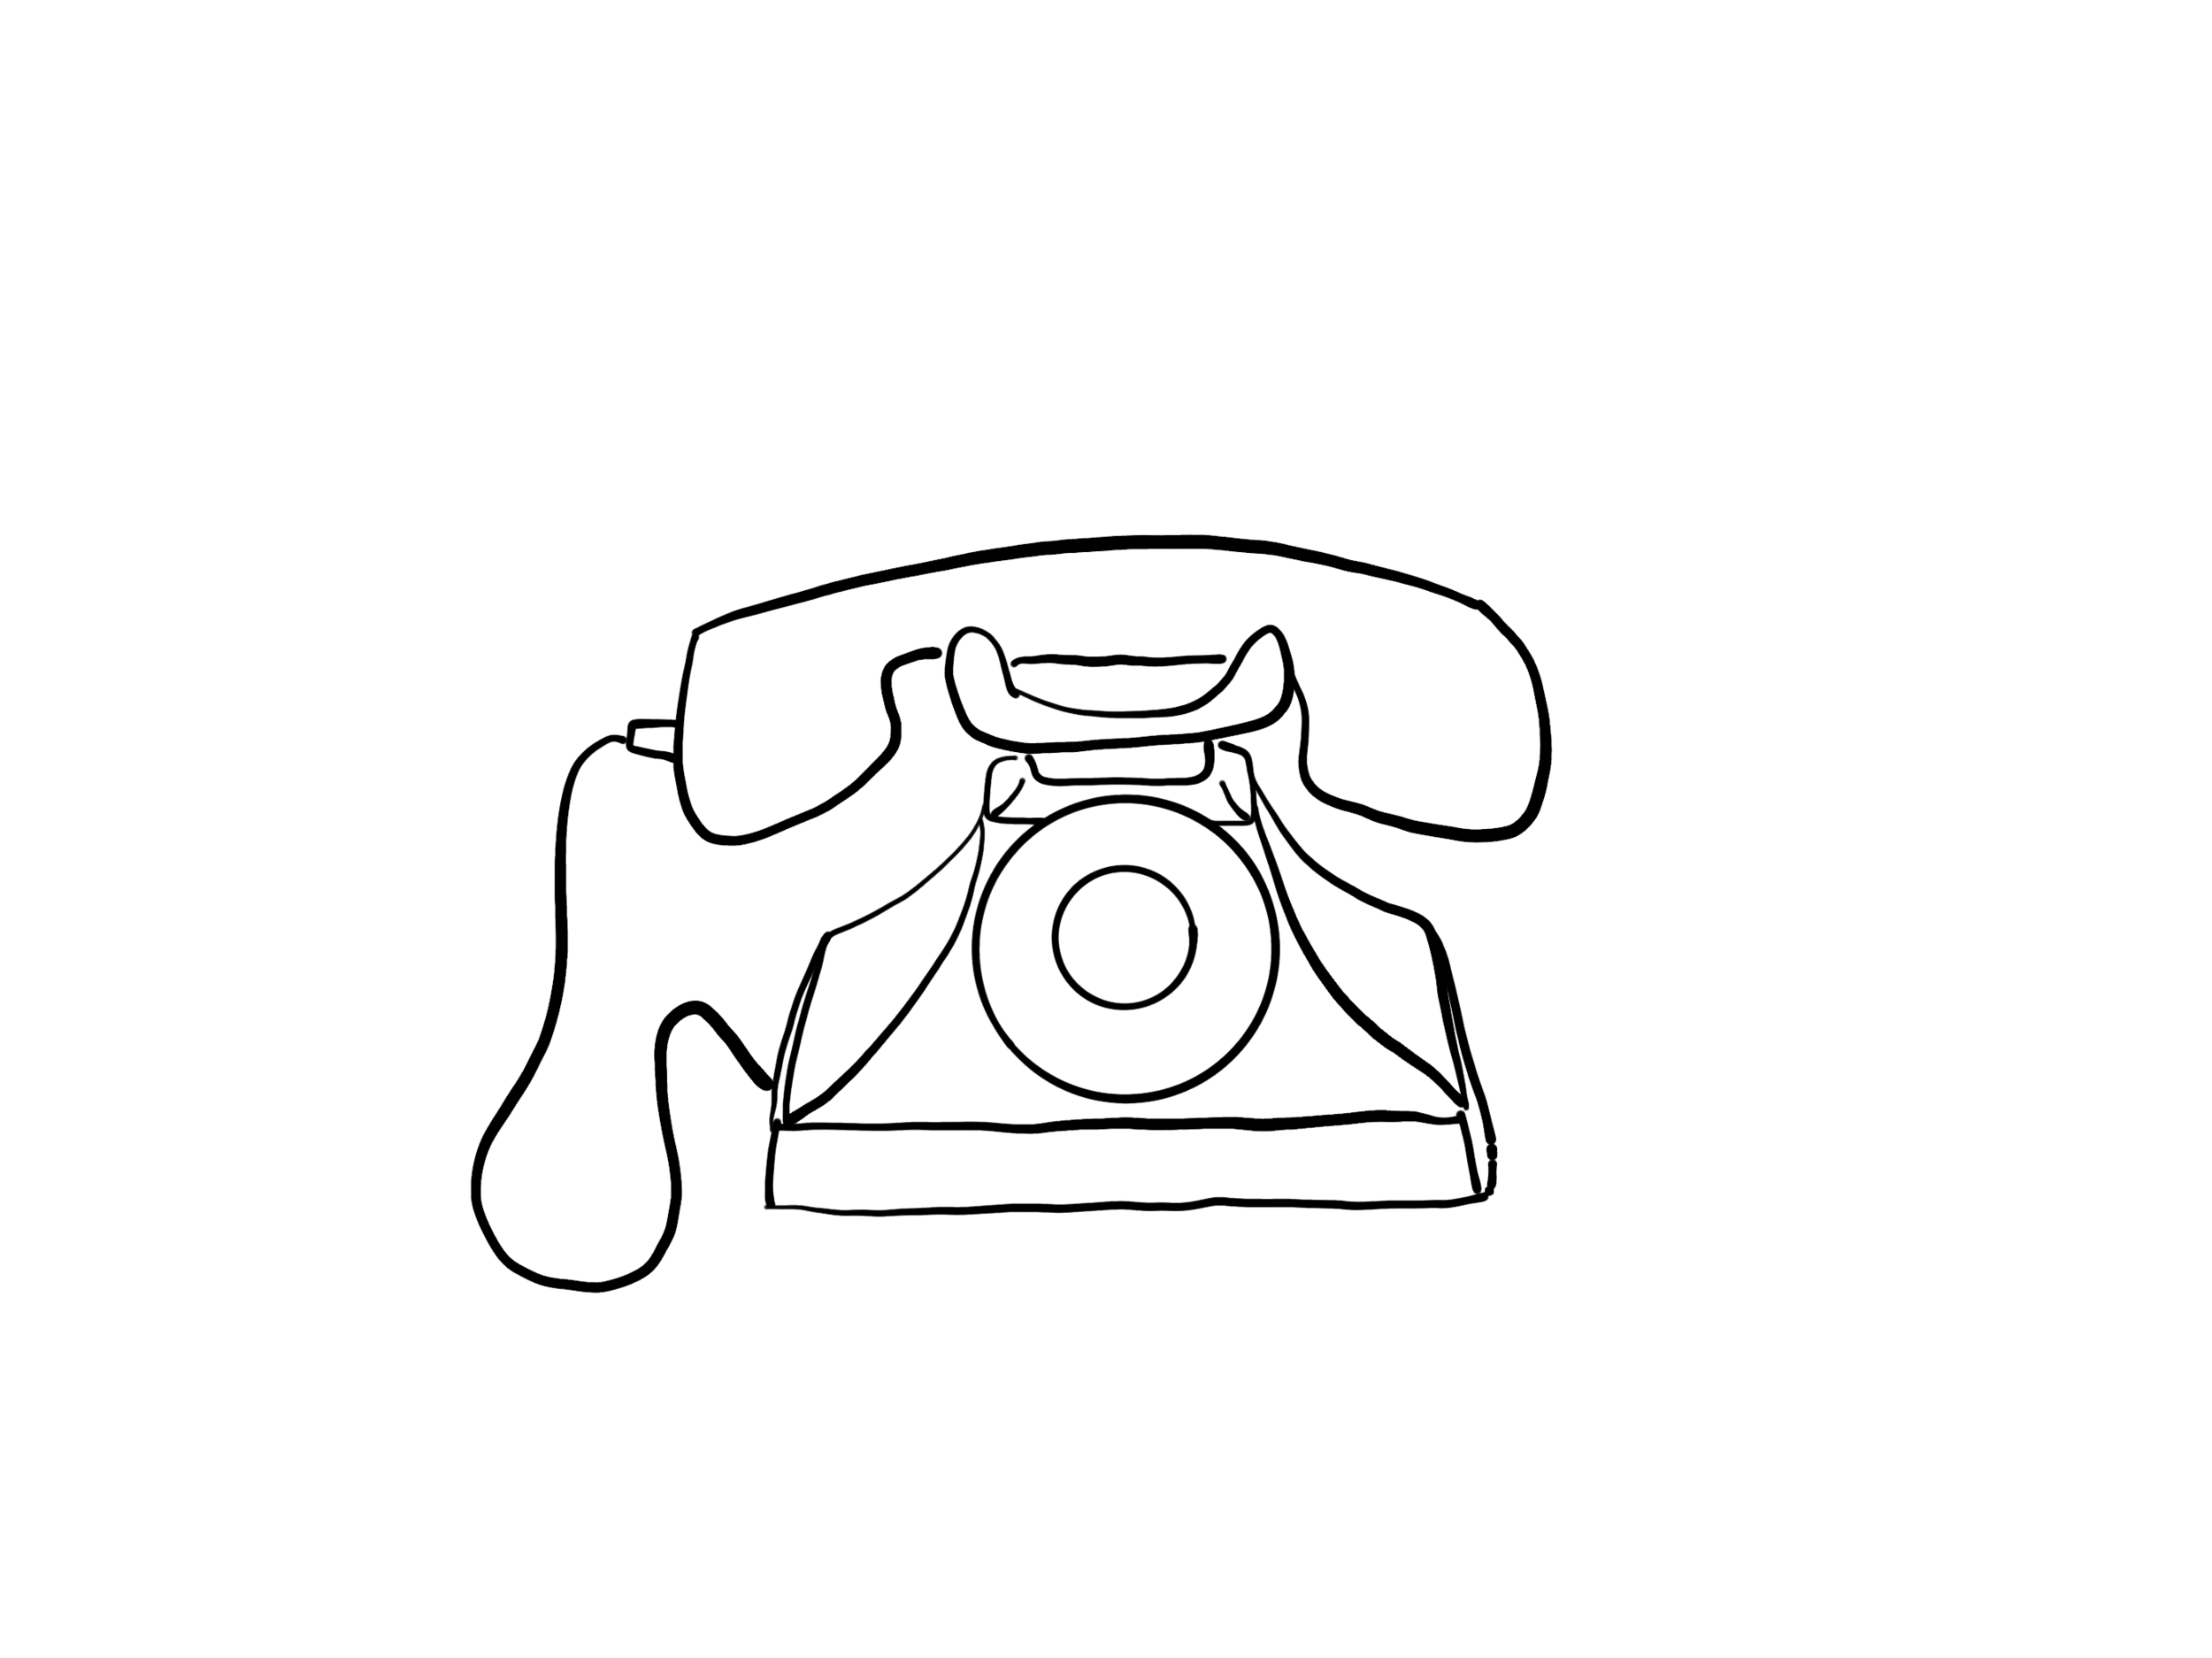 F0A1F07F-9F22-42C6-A962-EC8656113D7D.png